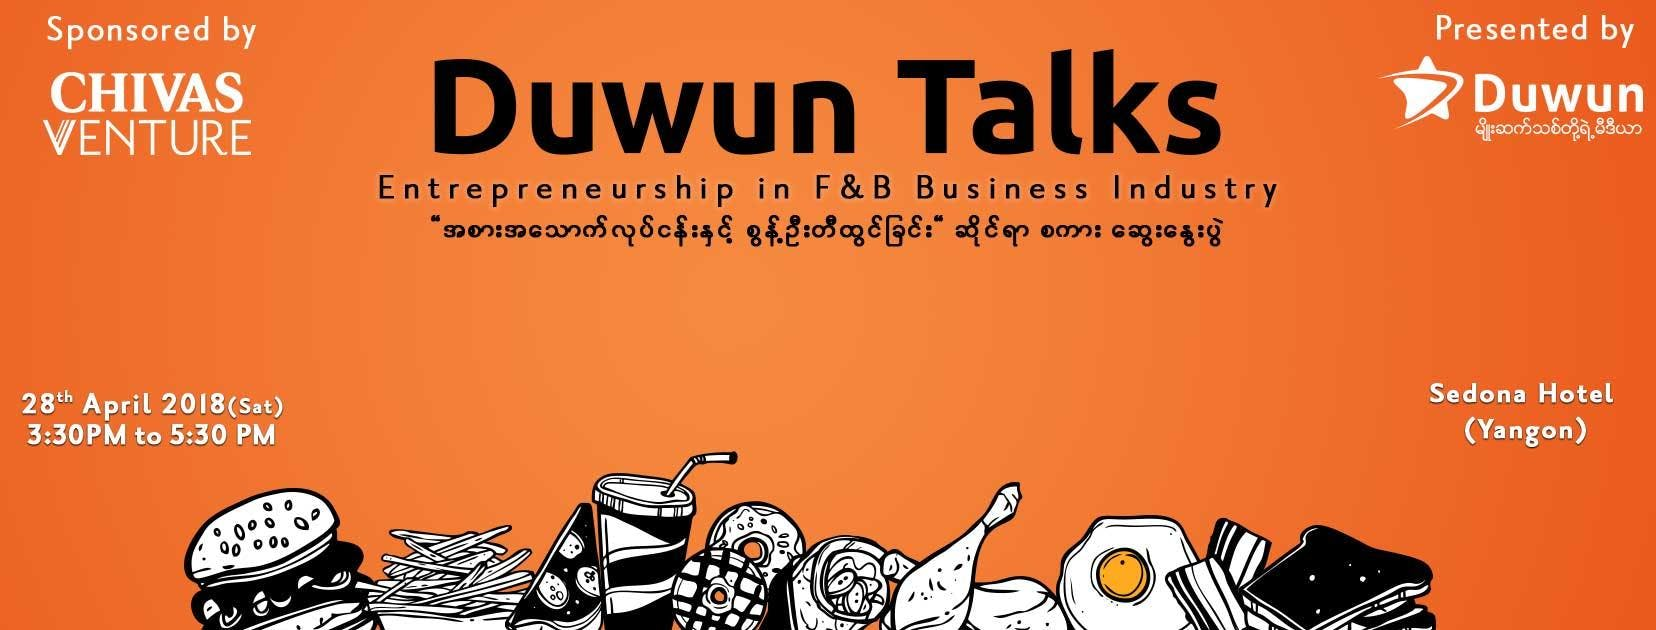 Duwun Talks